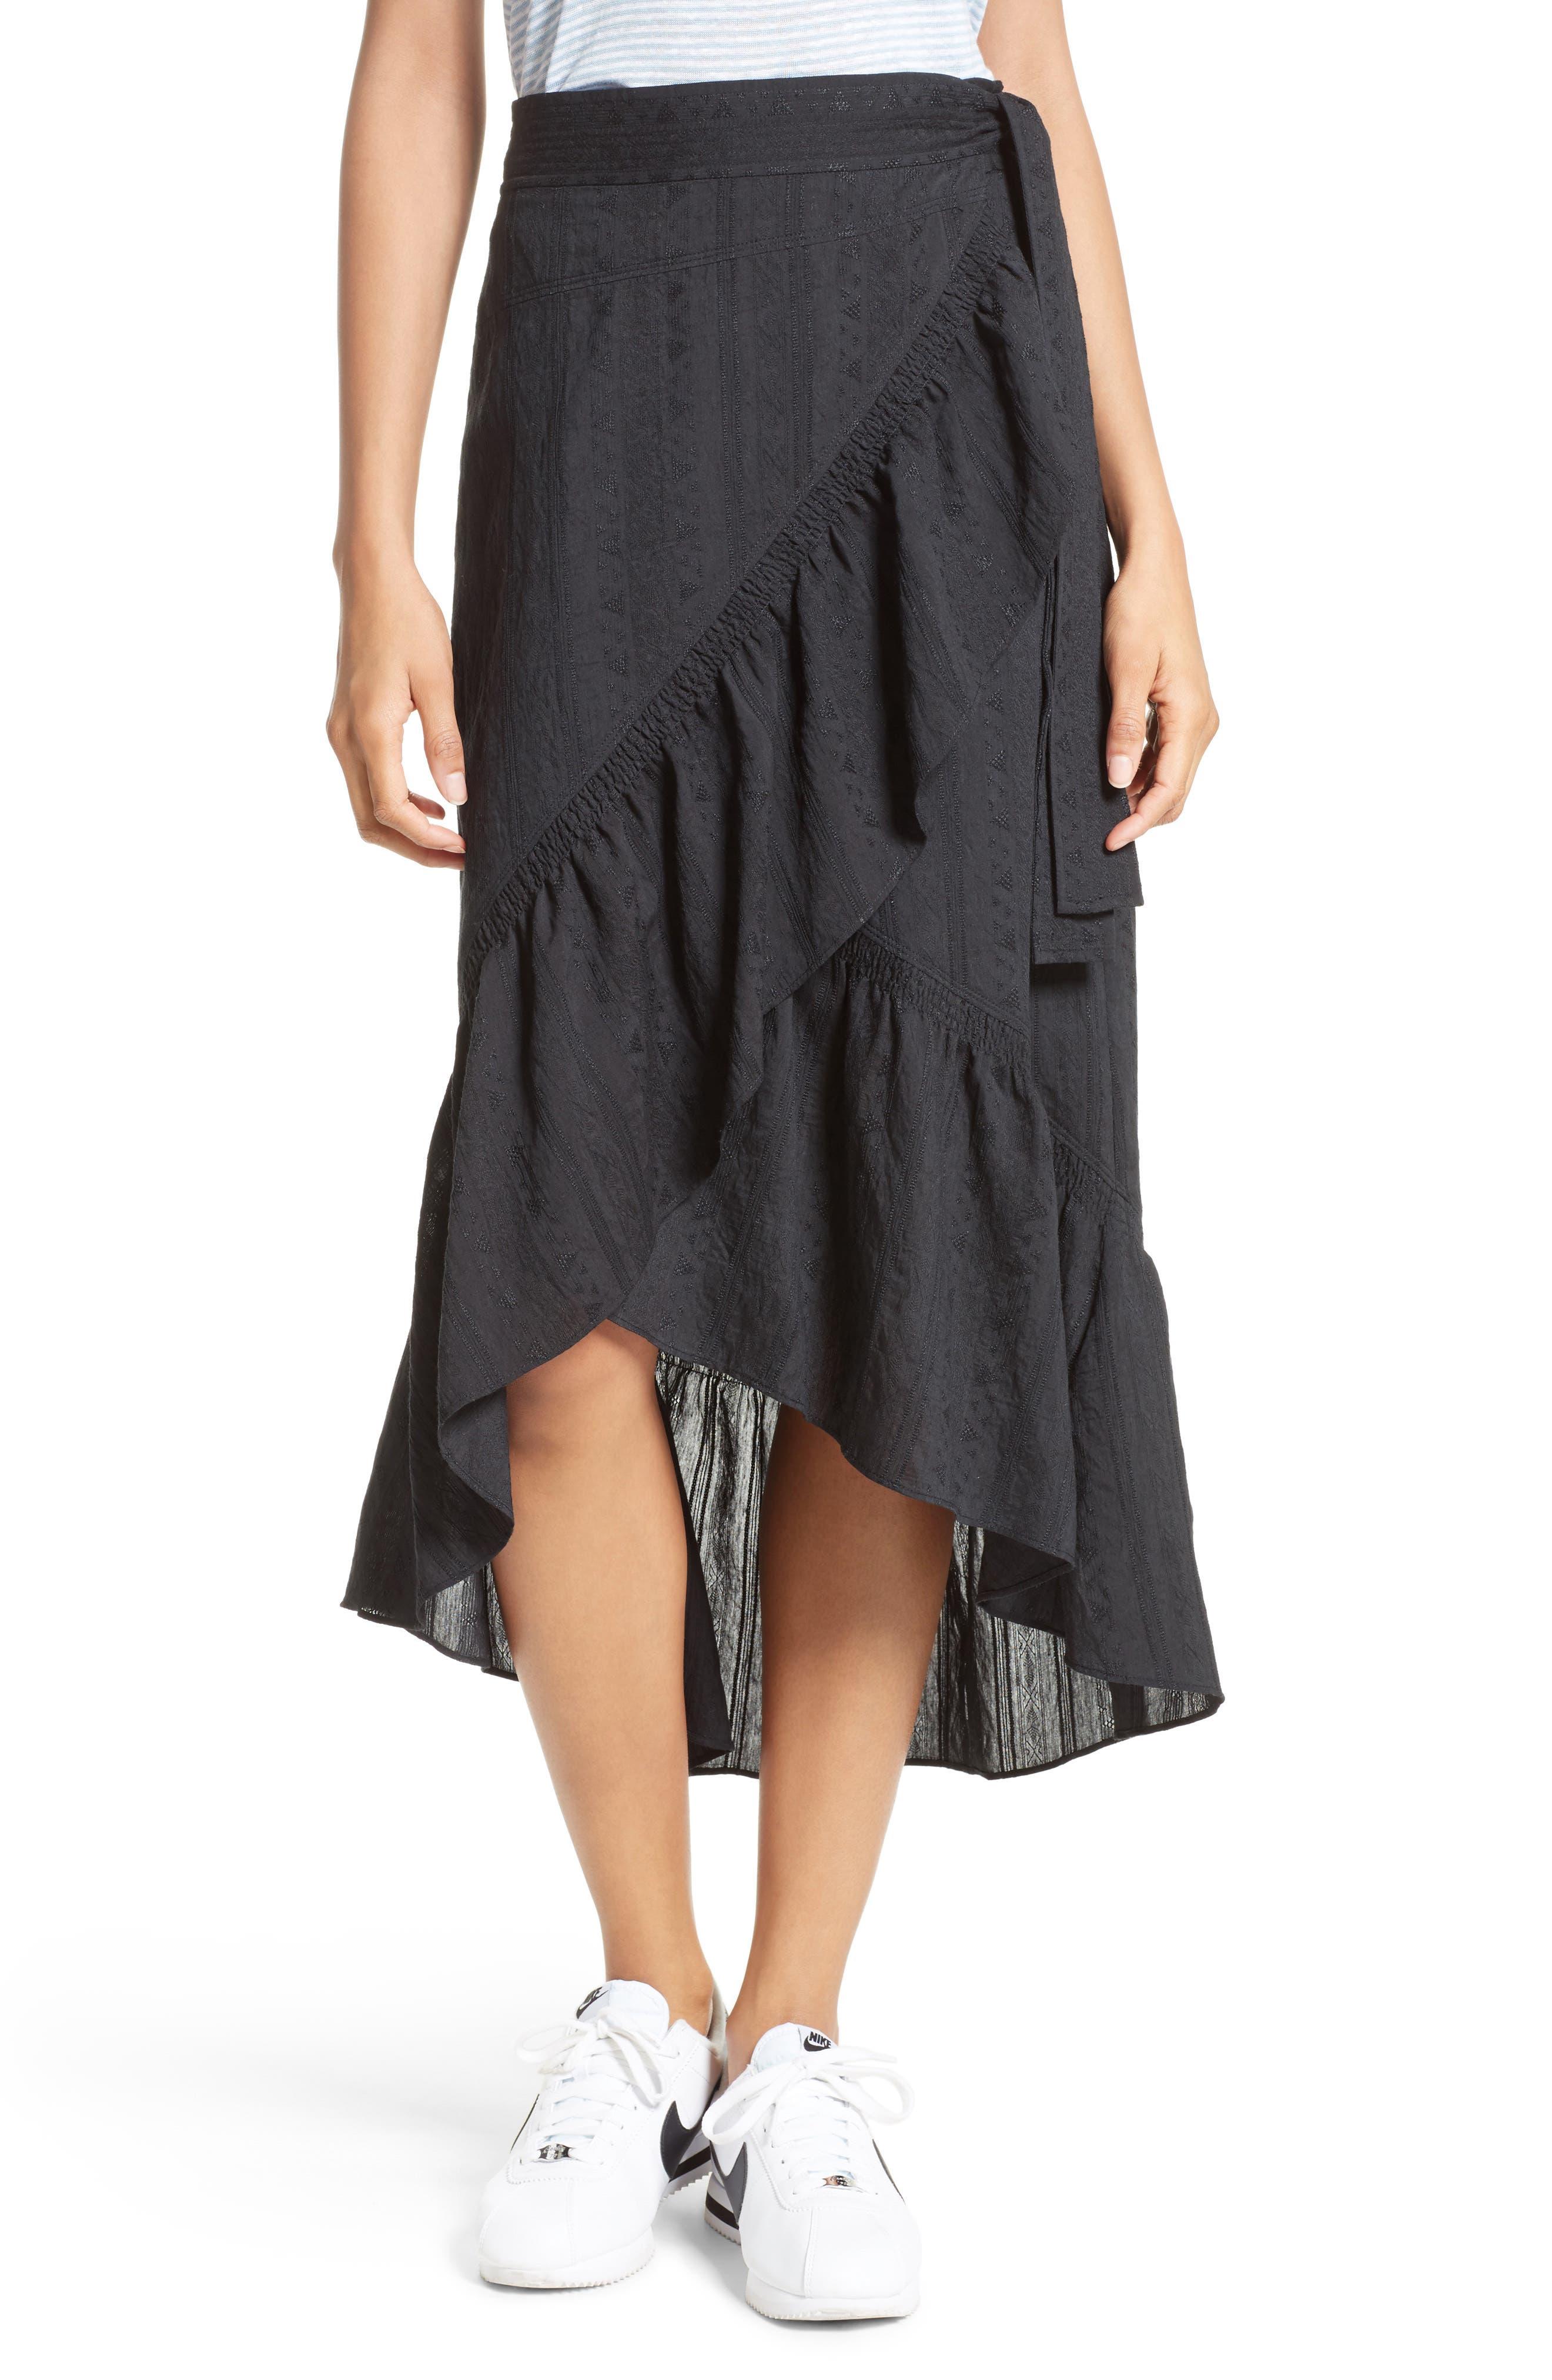 A.L.C. Charmaine Ruffle Skirt